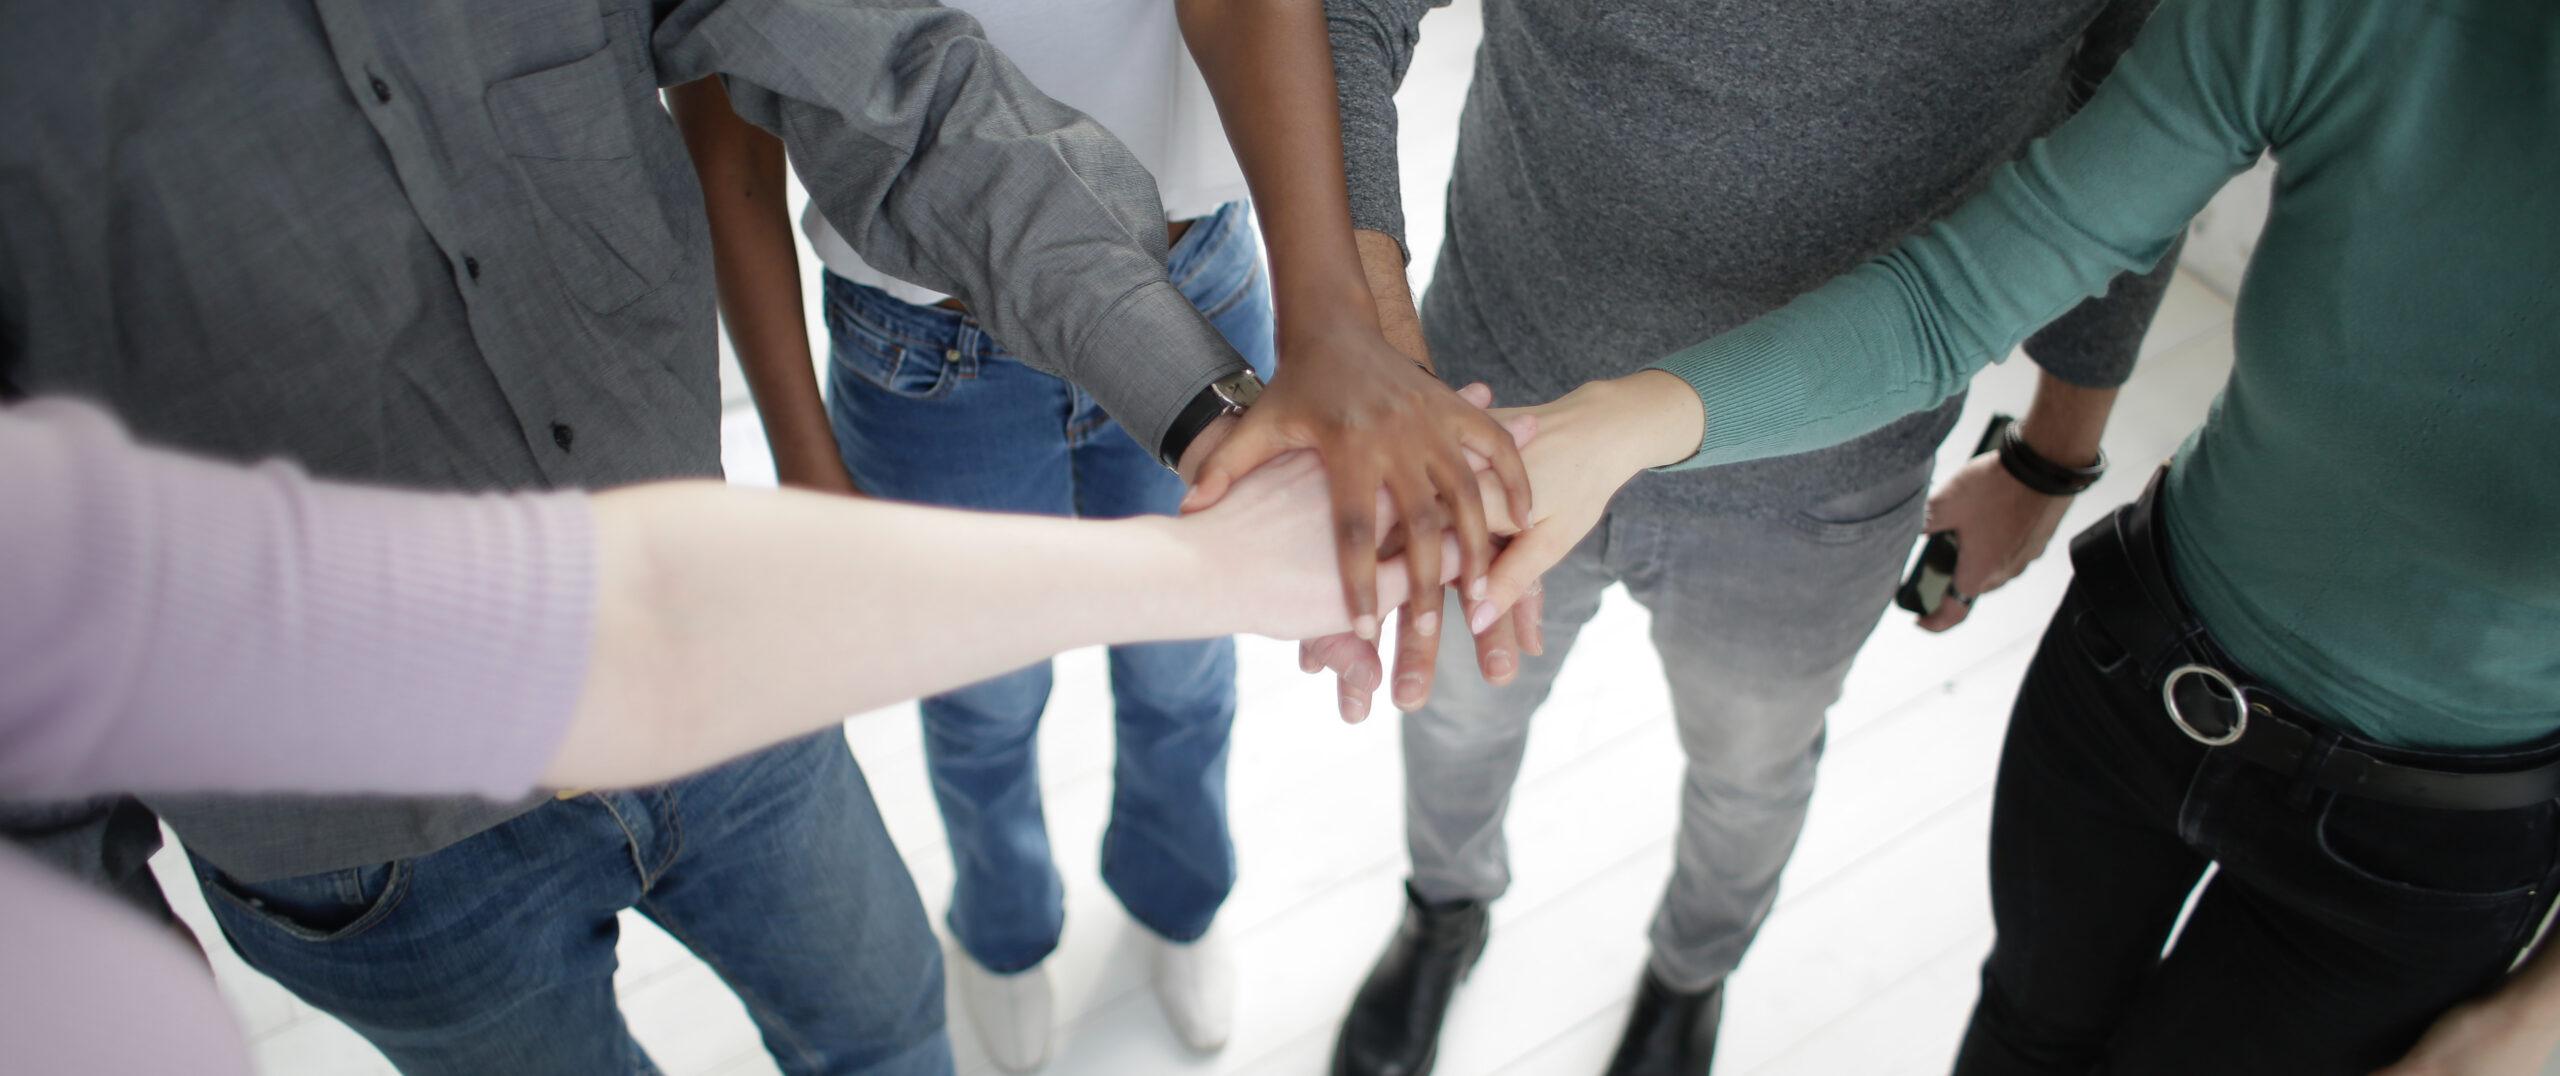 La Sortie - Partenariats pour aider les victimes d'exploitation sexuelle - La Sortie - Partherships to help victims of sexual exploitation (pexels-andrea-piacquadio-3931562)